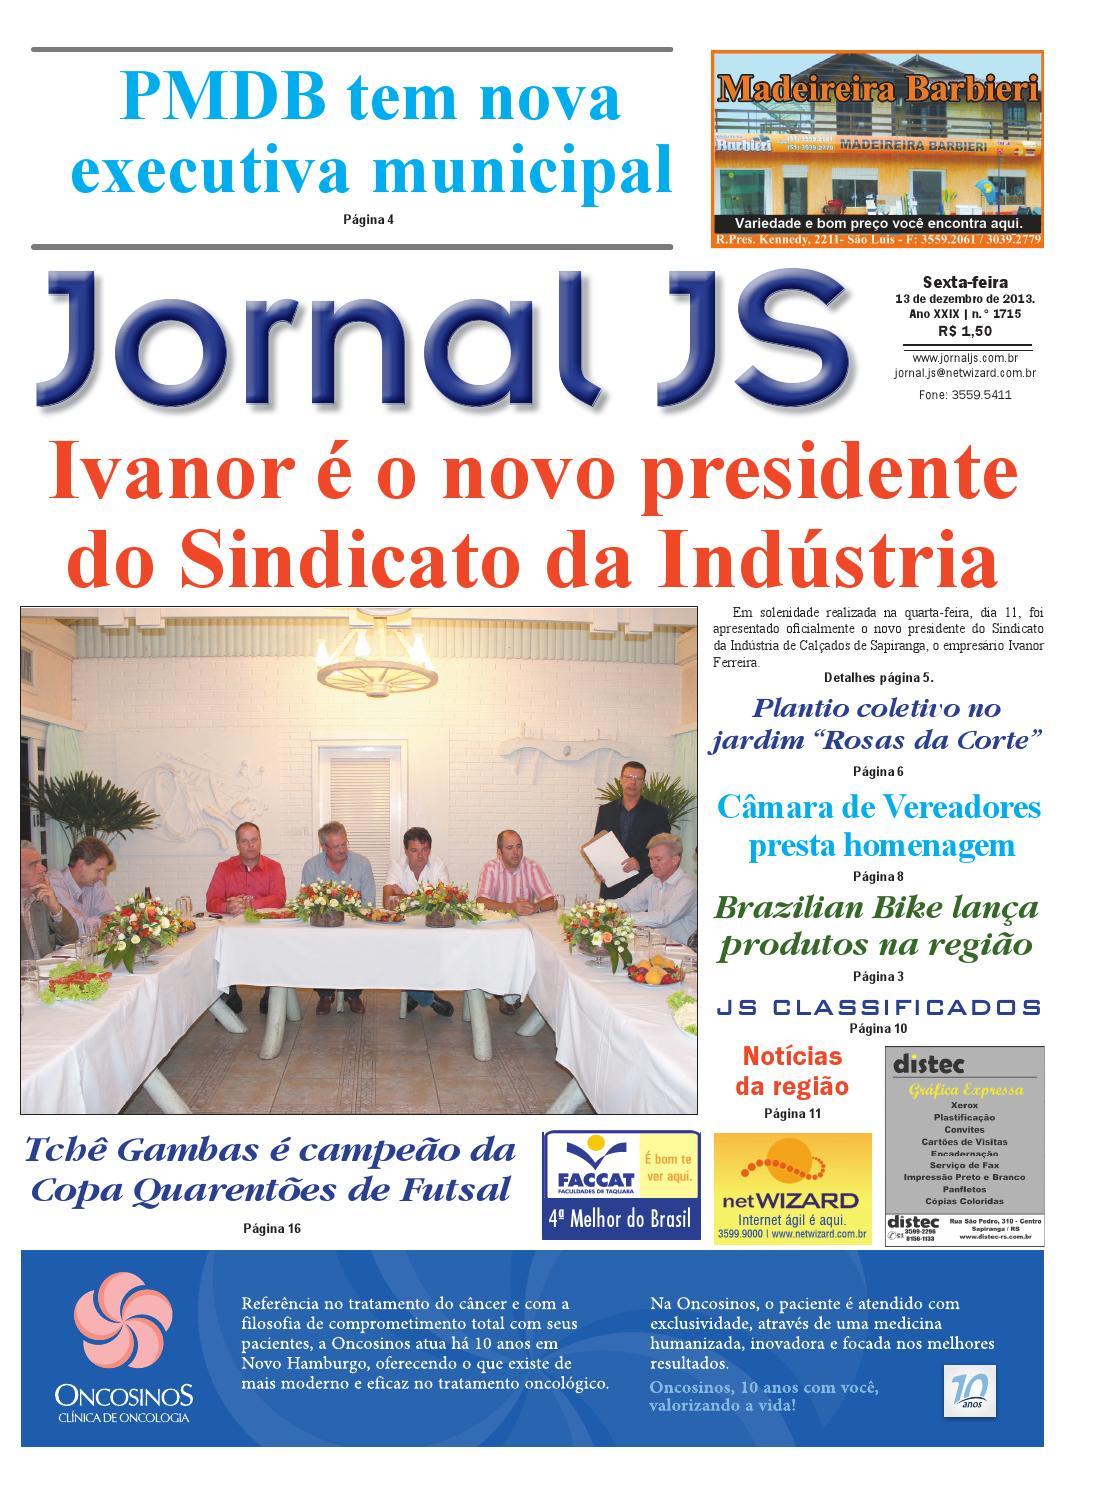 077c94725 Jornal JS - 13 de dezembro de 2013 by JORNAL JS - issuu